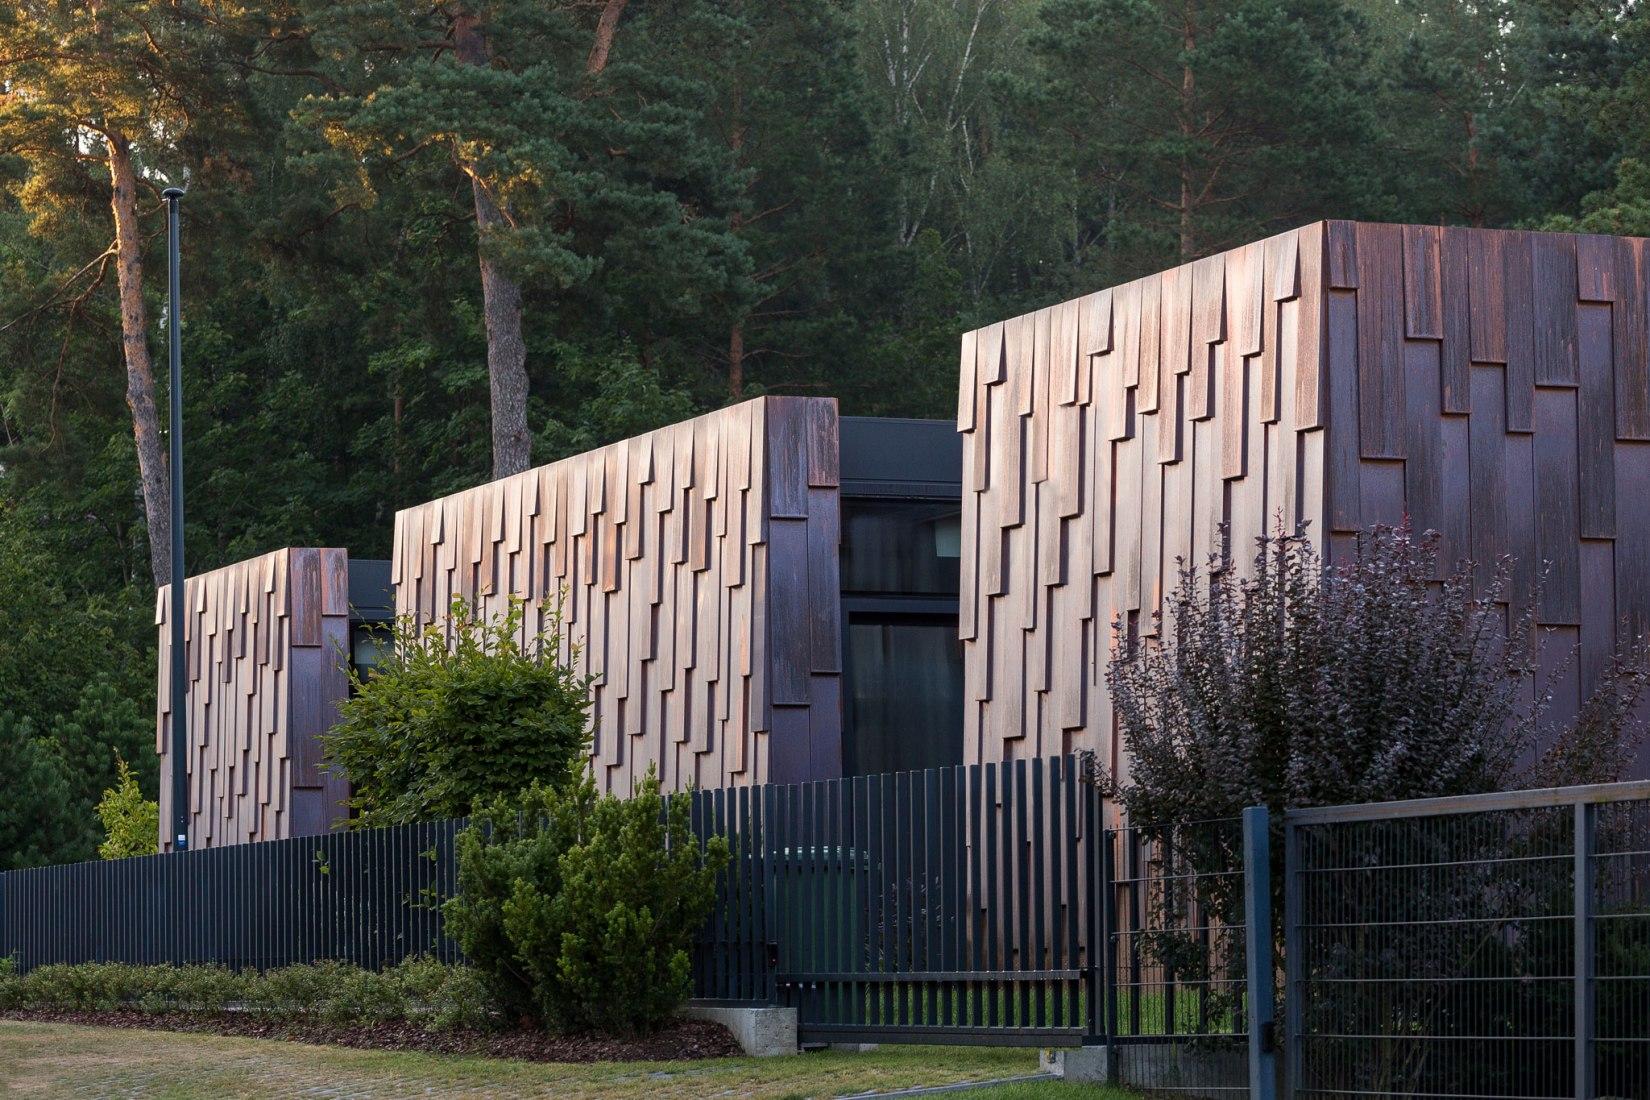 Moving Cubes por Arches. Fotografía por Norbert Tukaj.